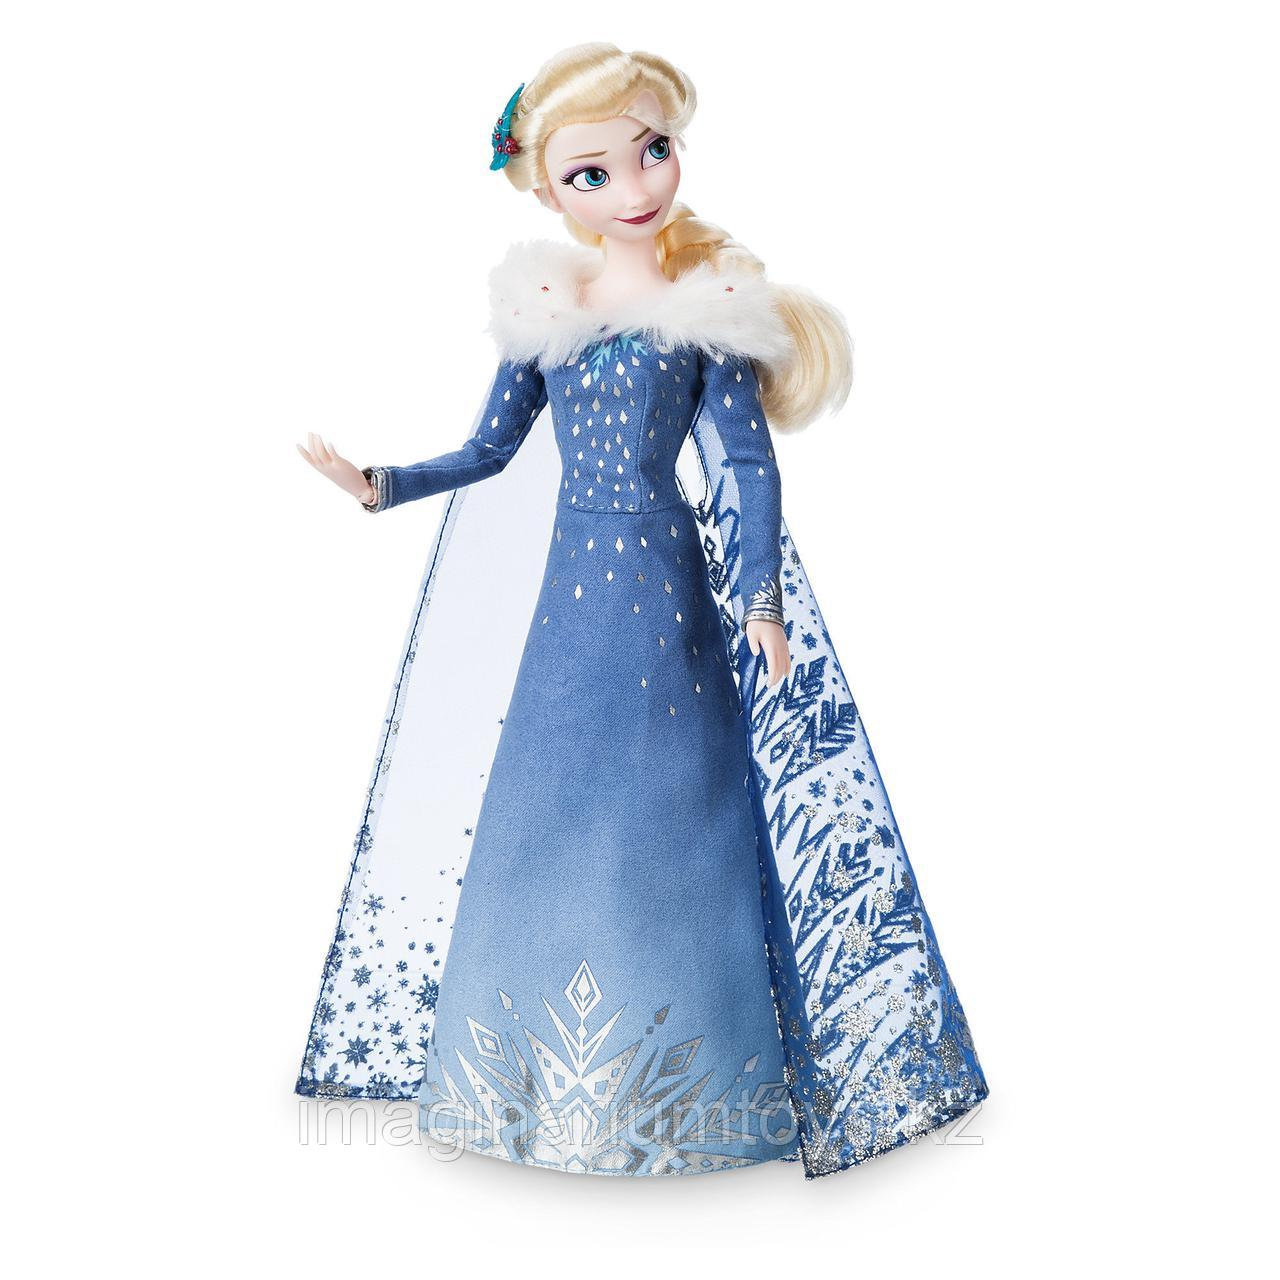 Кукла поющая Эльза Disney